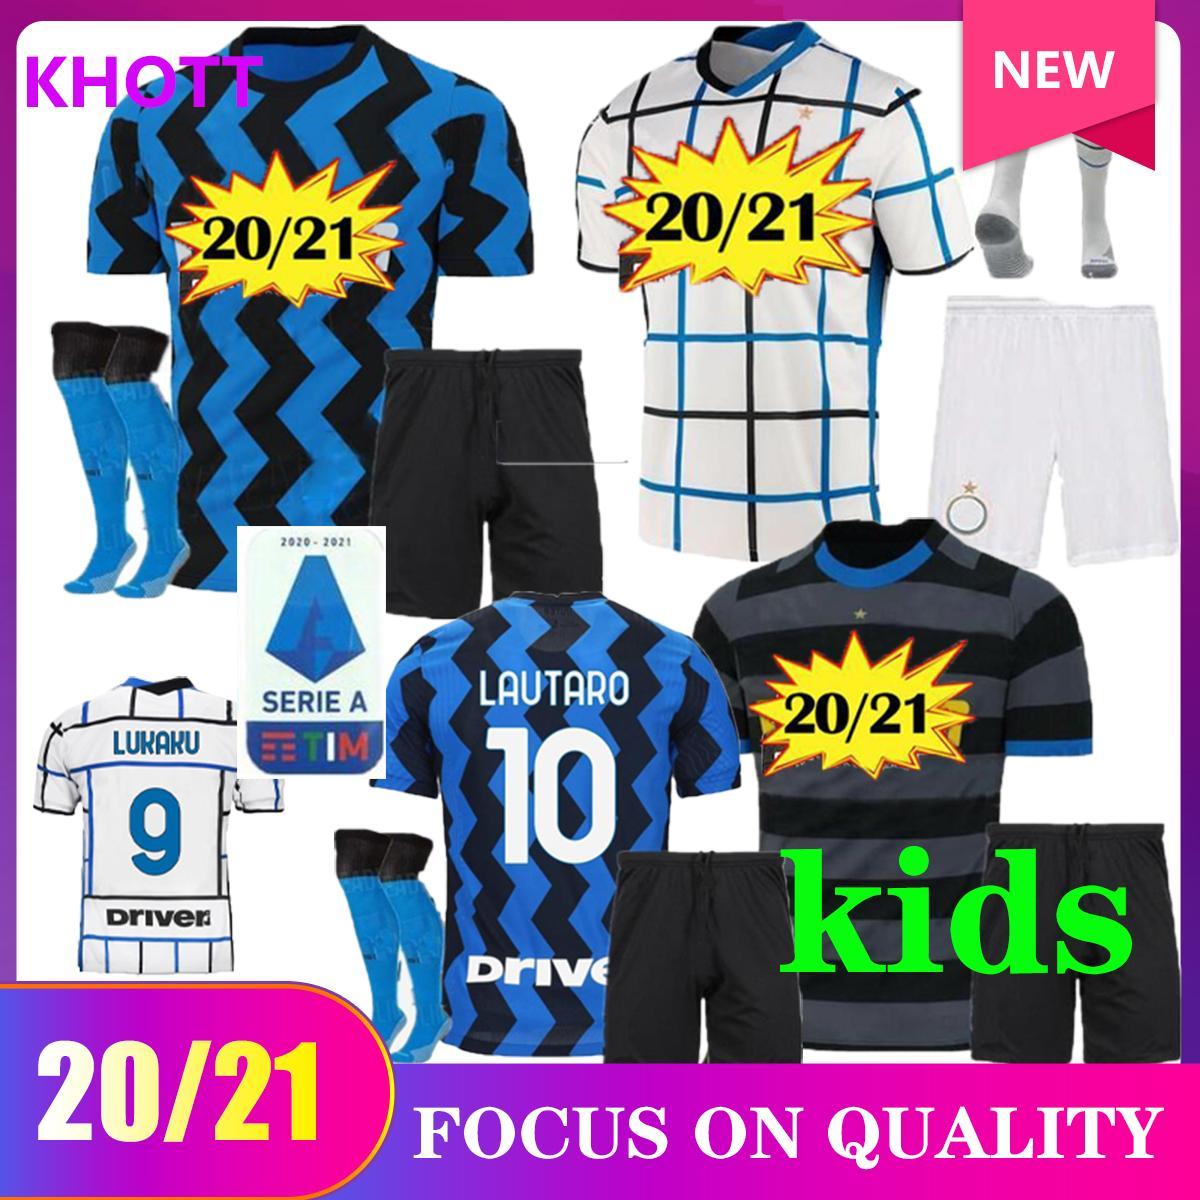 20 21 Lukaku Eriksen Lautaro Home Home Jersey Kit Kit 2020 2021 Kid Kit Alexis Sensi Skriniar Brozovic Milano Camicia da calcio Set uniformi